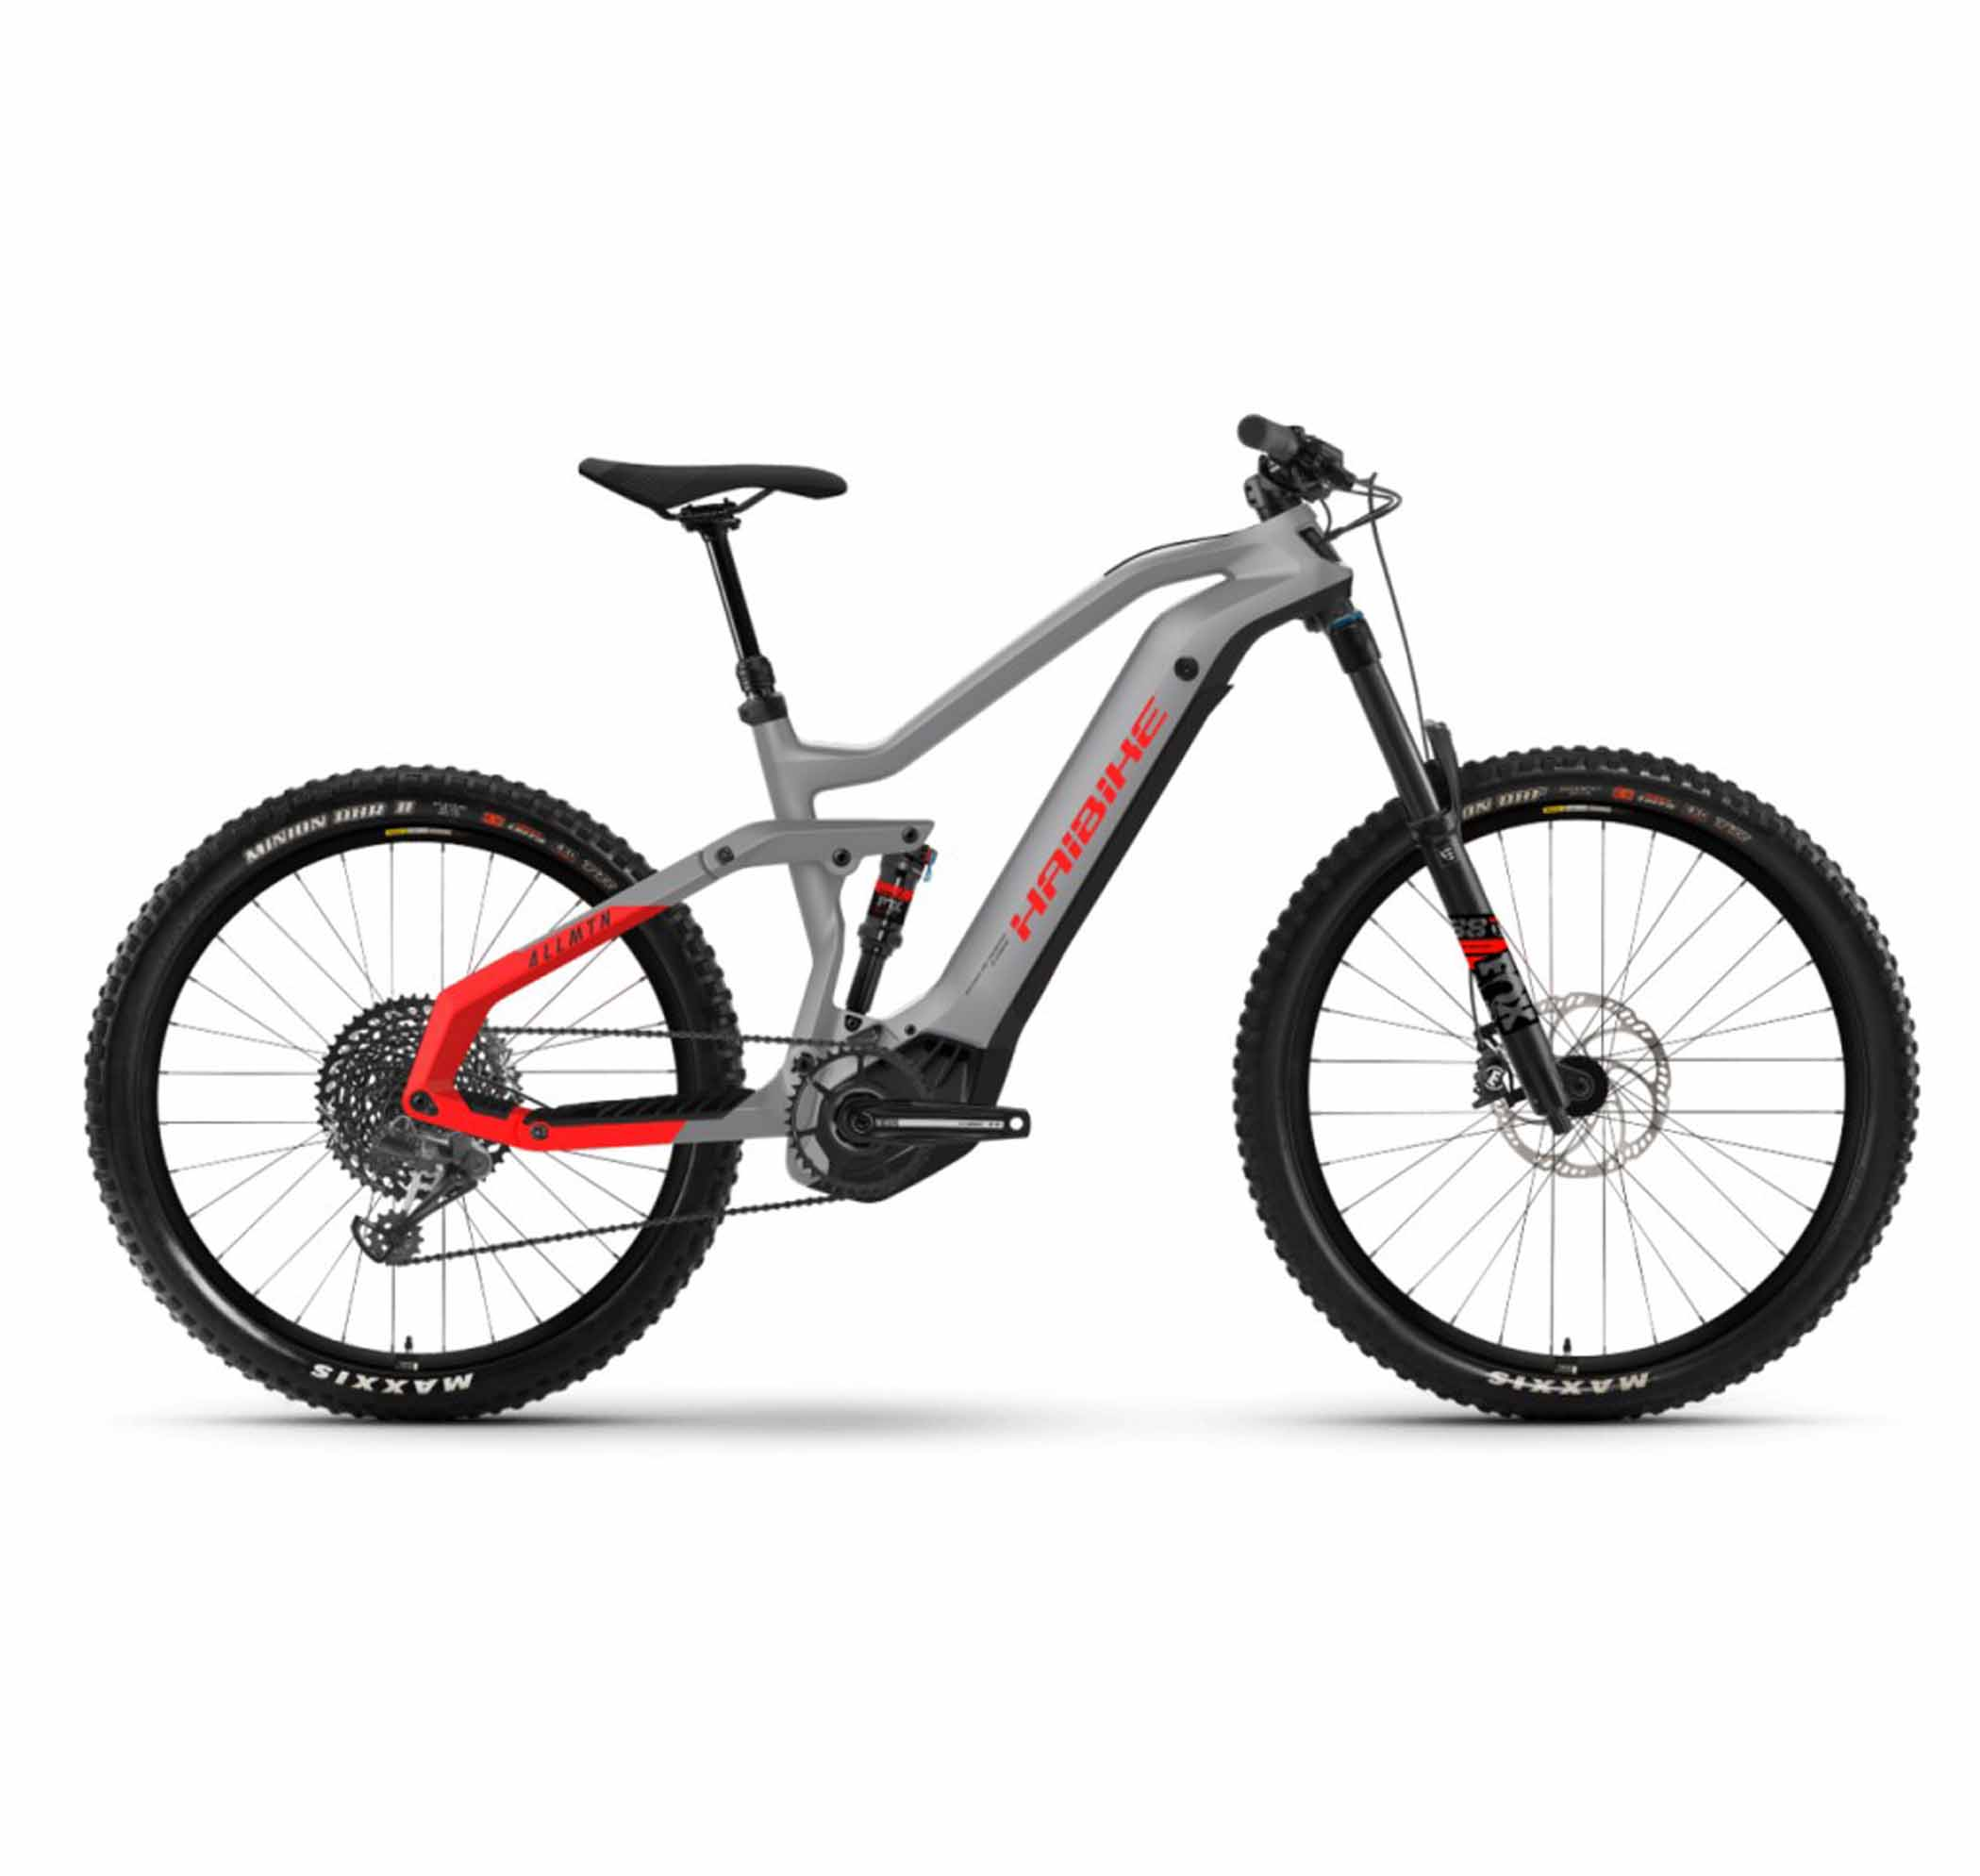 Haibike_Rodeo_Bike_Yamaha_Allmtn_6_i600WH_Grey